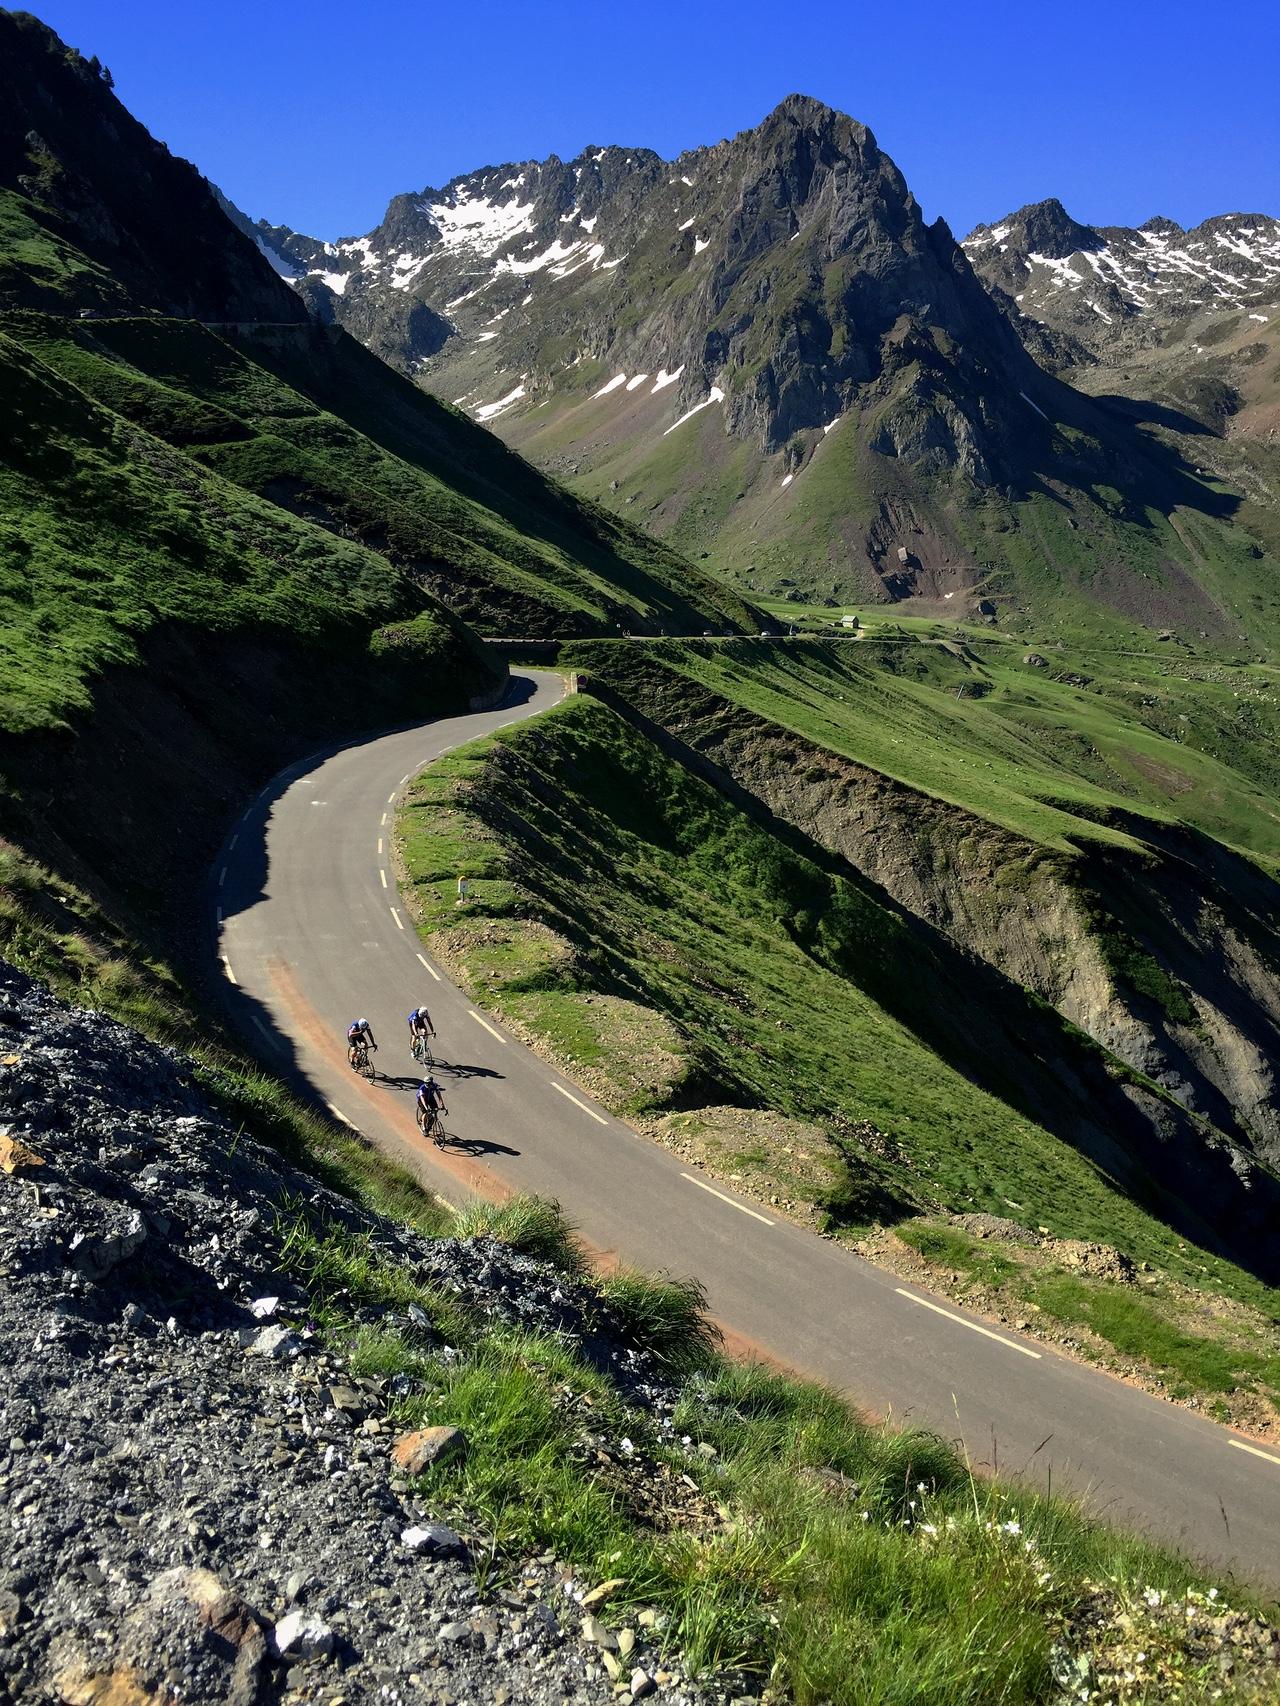 Climbing the Tourmalet. TdF coming soon!